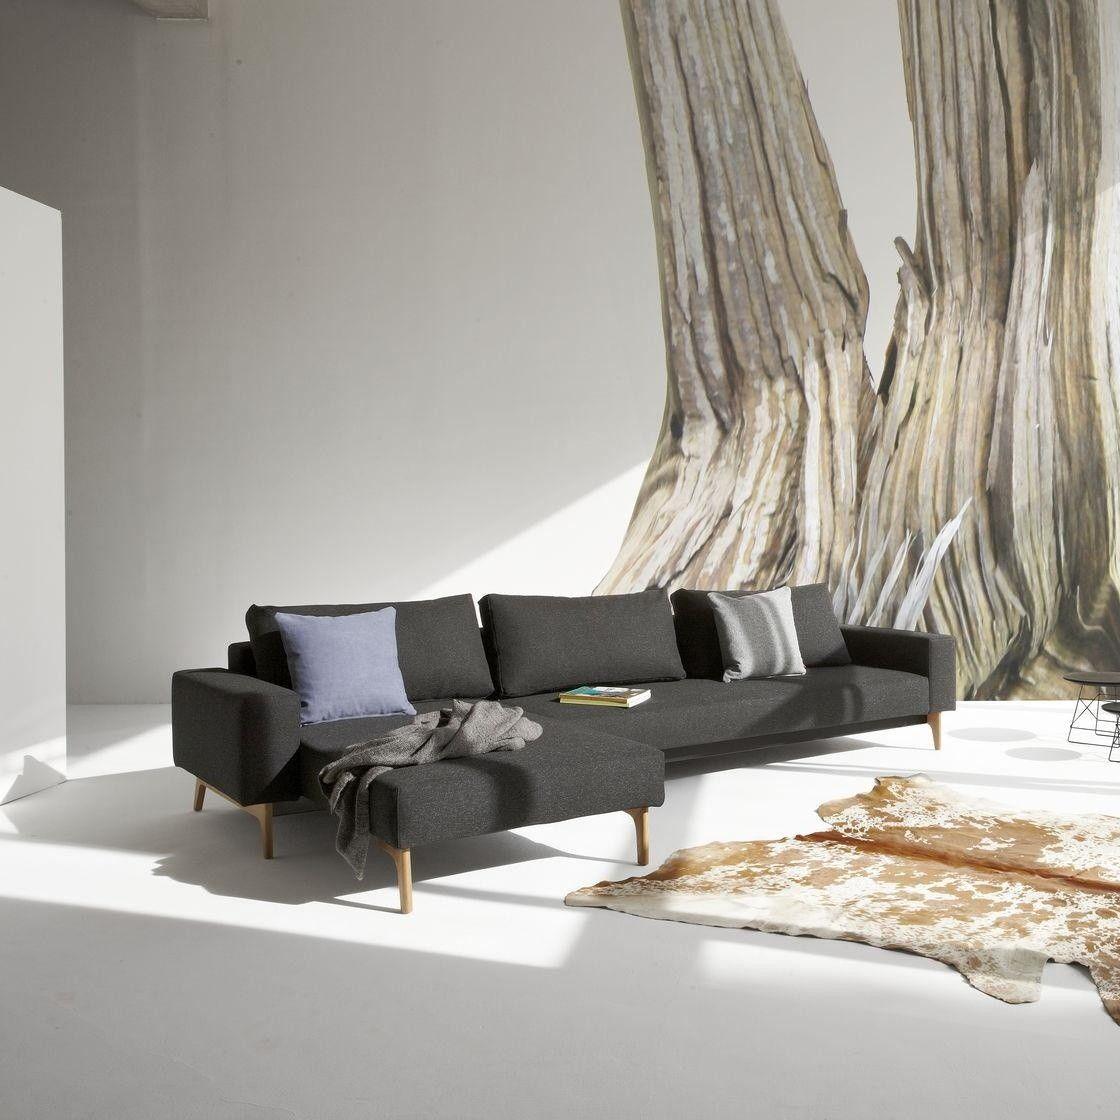 idun schlafsofa innovation. Black Bedroom Furniture Sets. Home Design Ideas